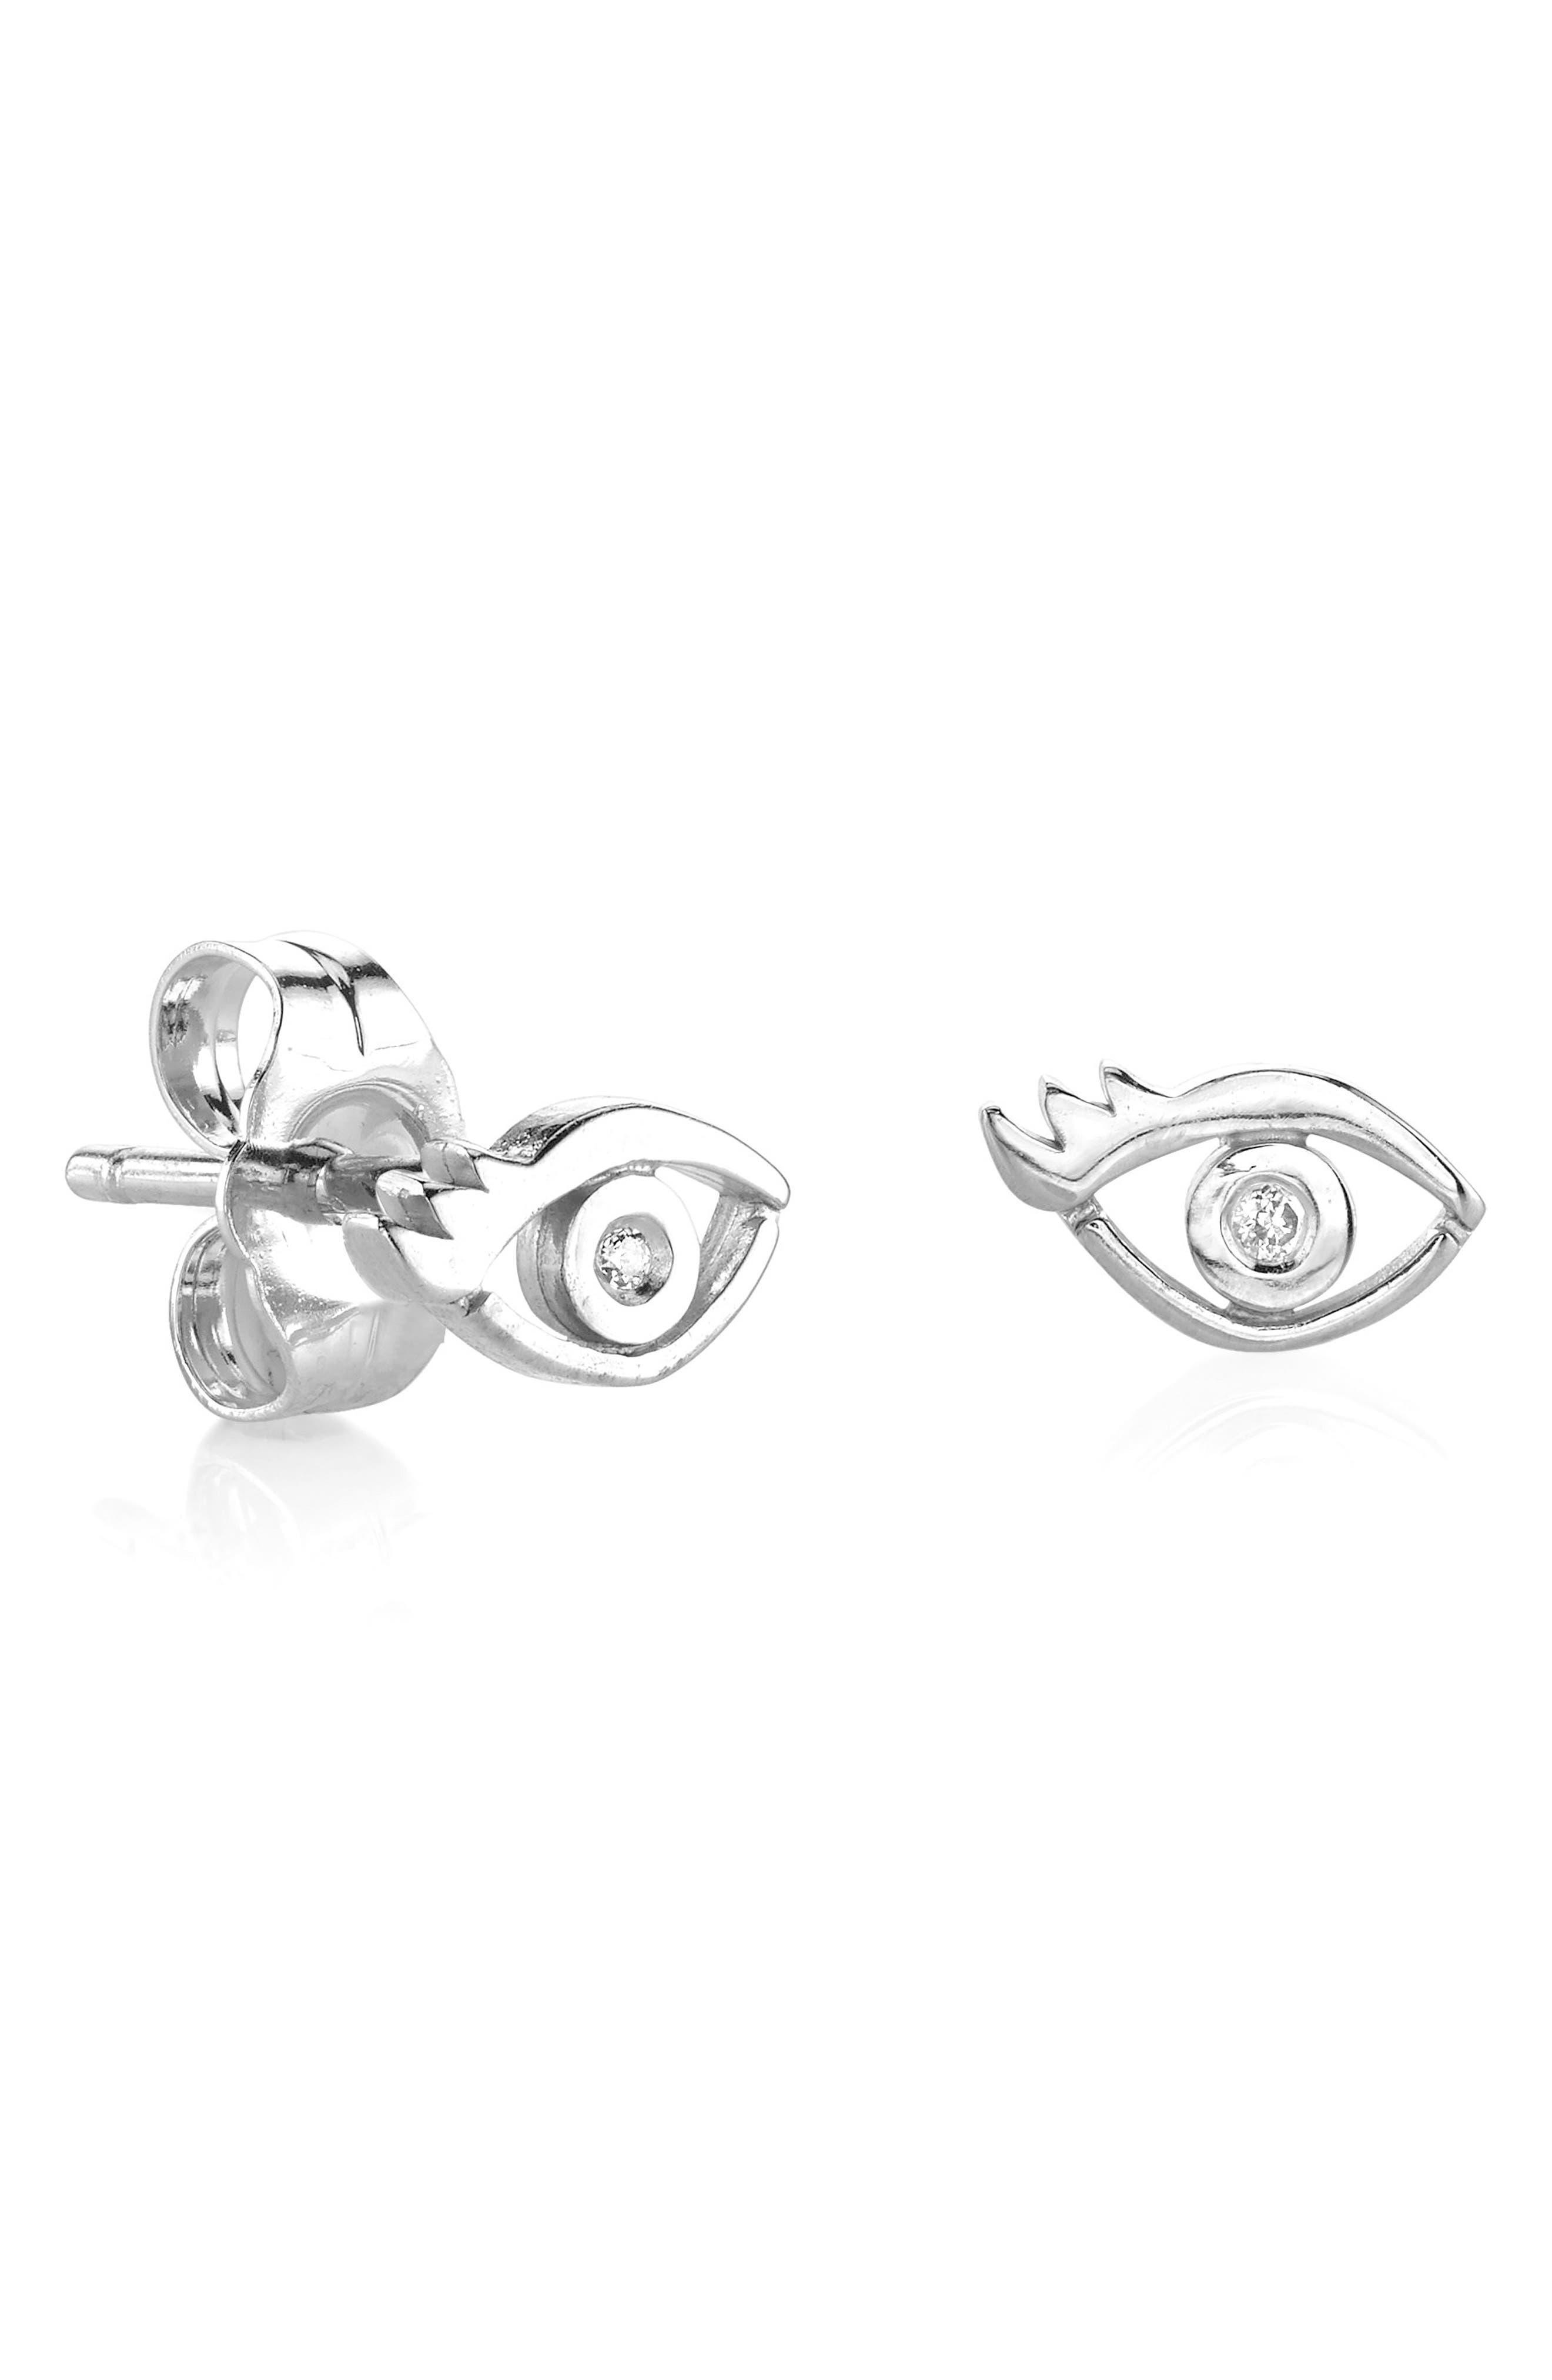 Shy by SE Evil Eye Diamond Stud Earrings,                             Main thumbnail 1, color,                             SILVER